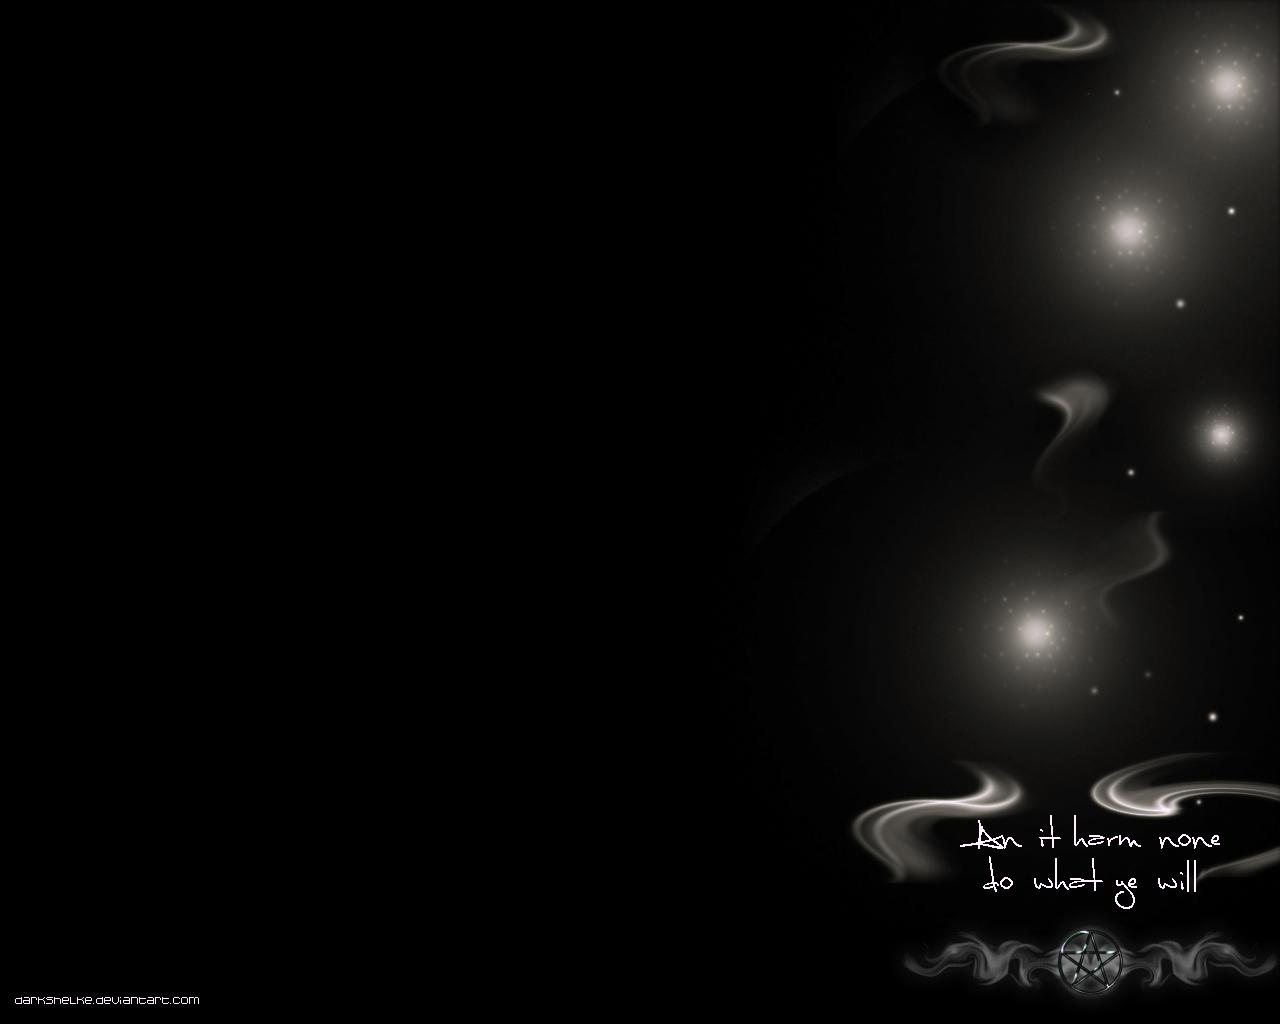 Wicca Ritual Wicca Wallpaper PicsWallpapercom 1280x1024